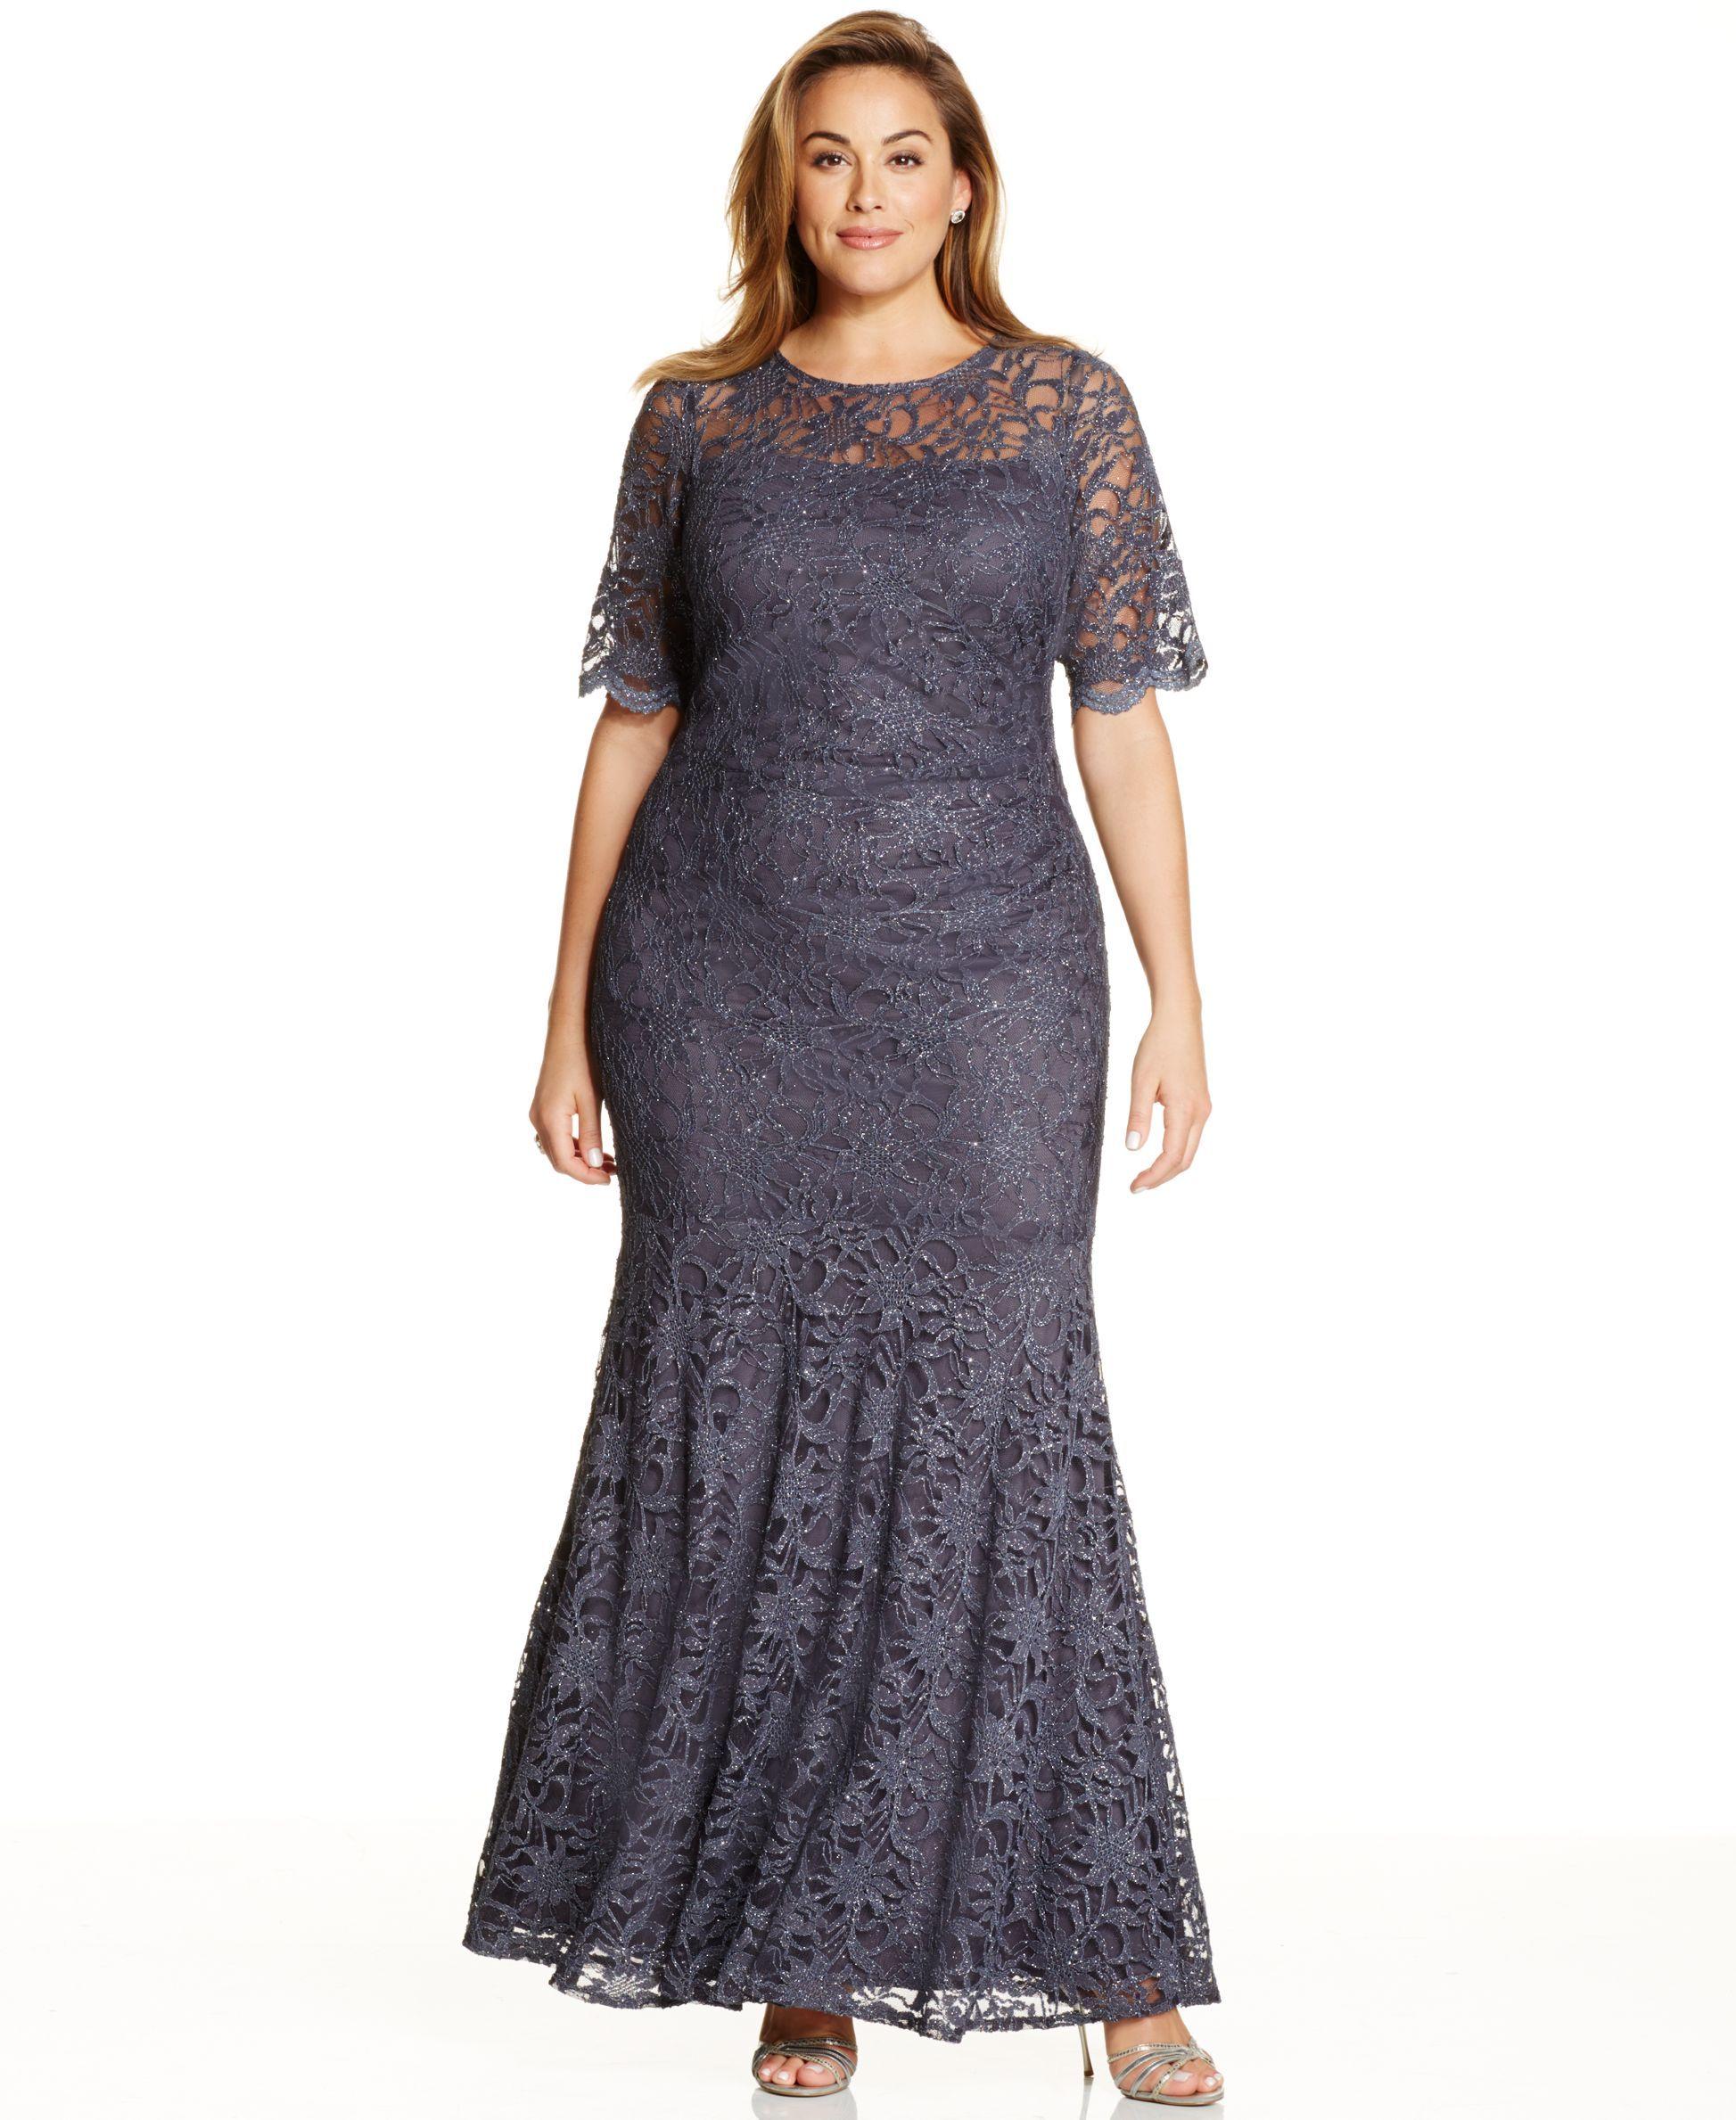 Xscape Plus Size Lace Shimmer Mermaid Gown | moda pluss | Pinterest ...